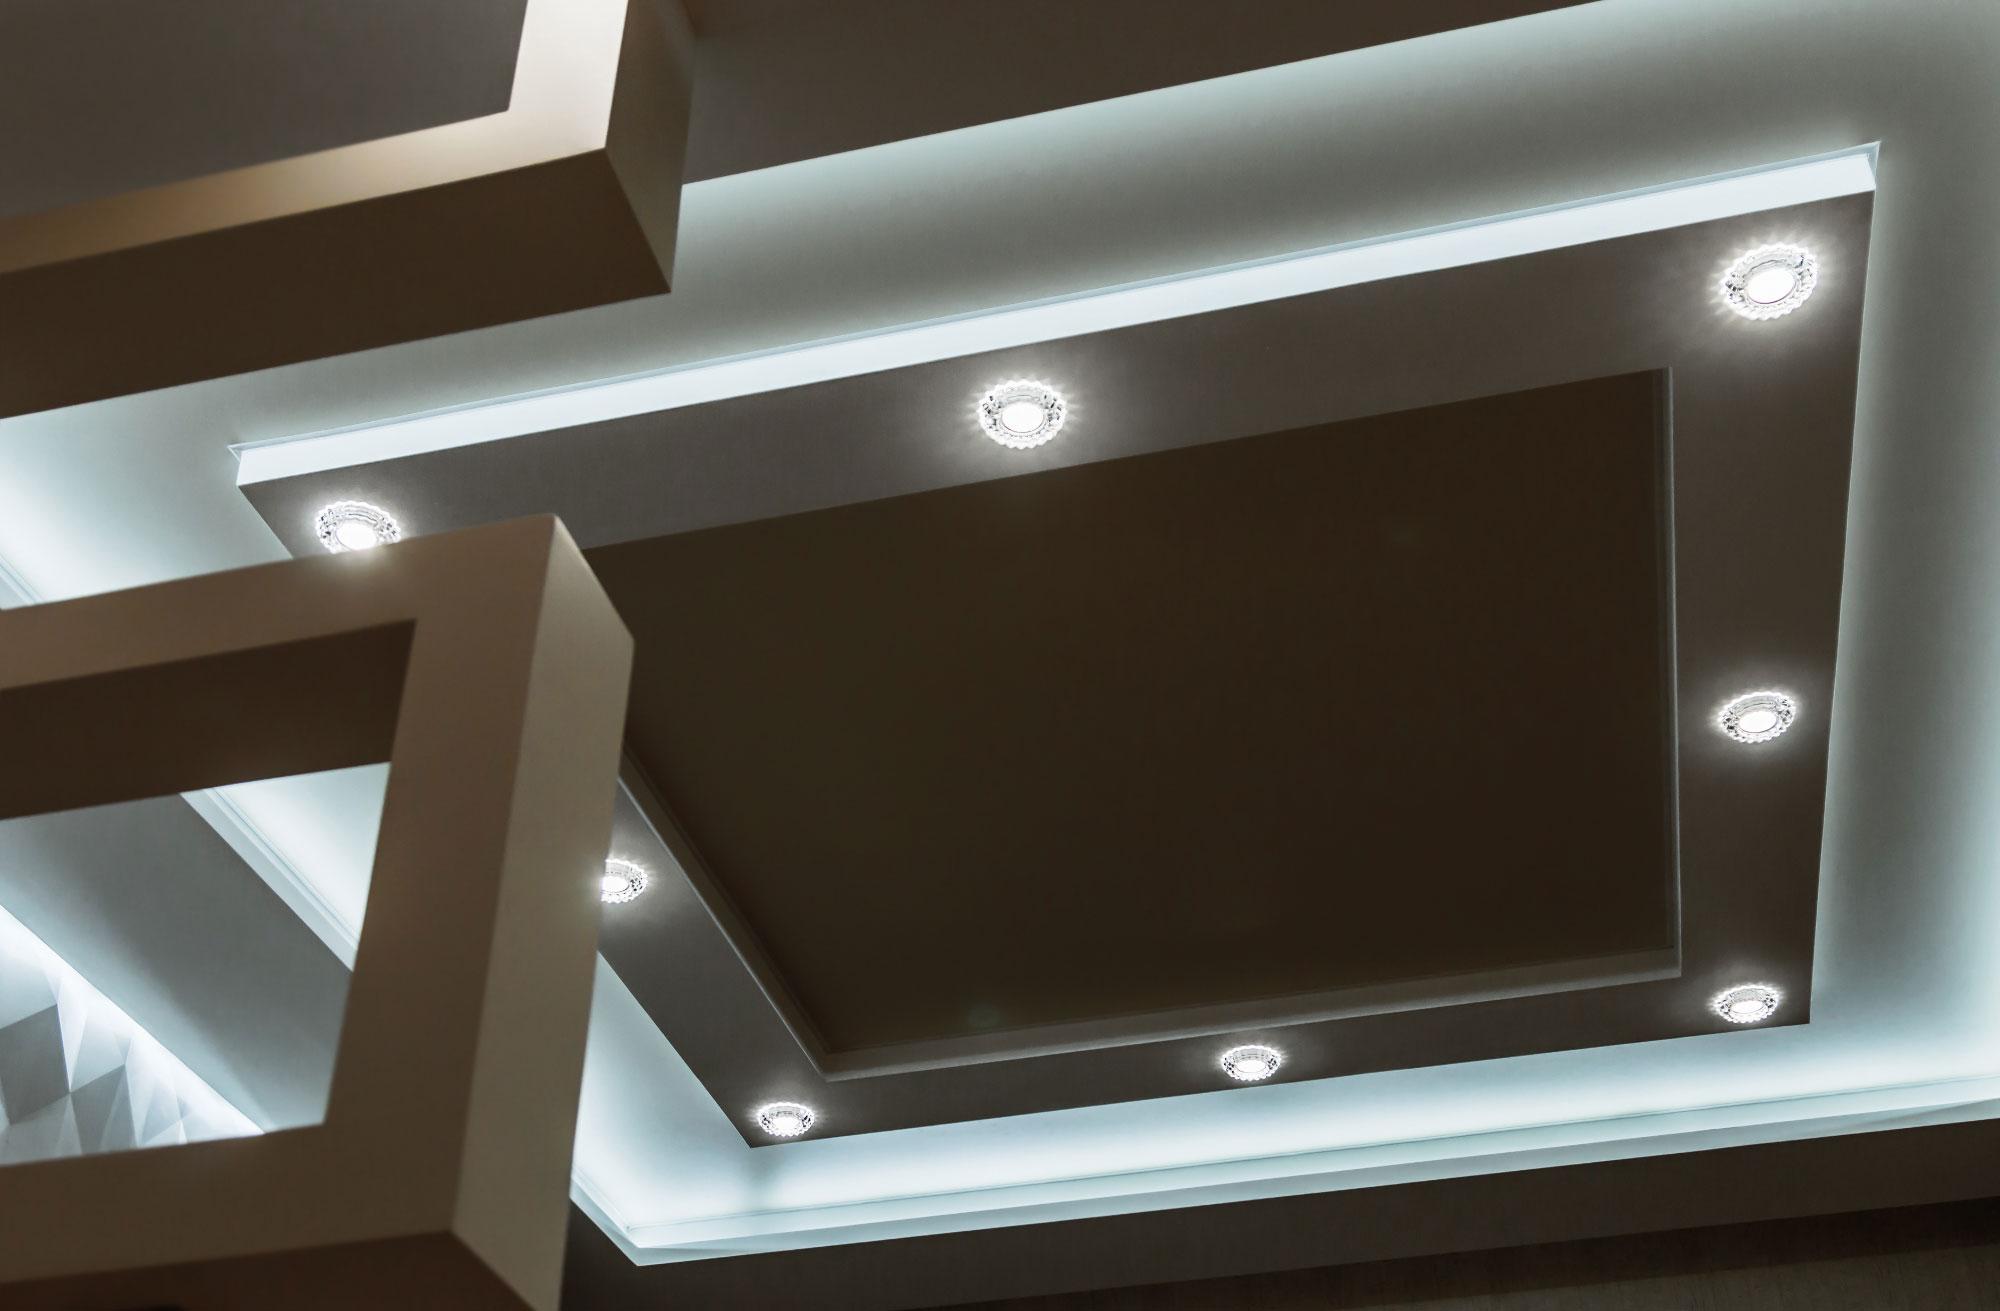 Alimentatori per sistemi di illuminazione a led espo for Sistemi di illuminazione